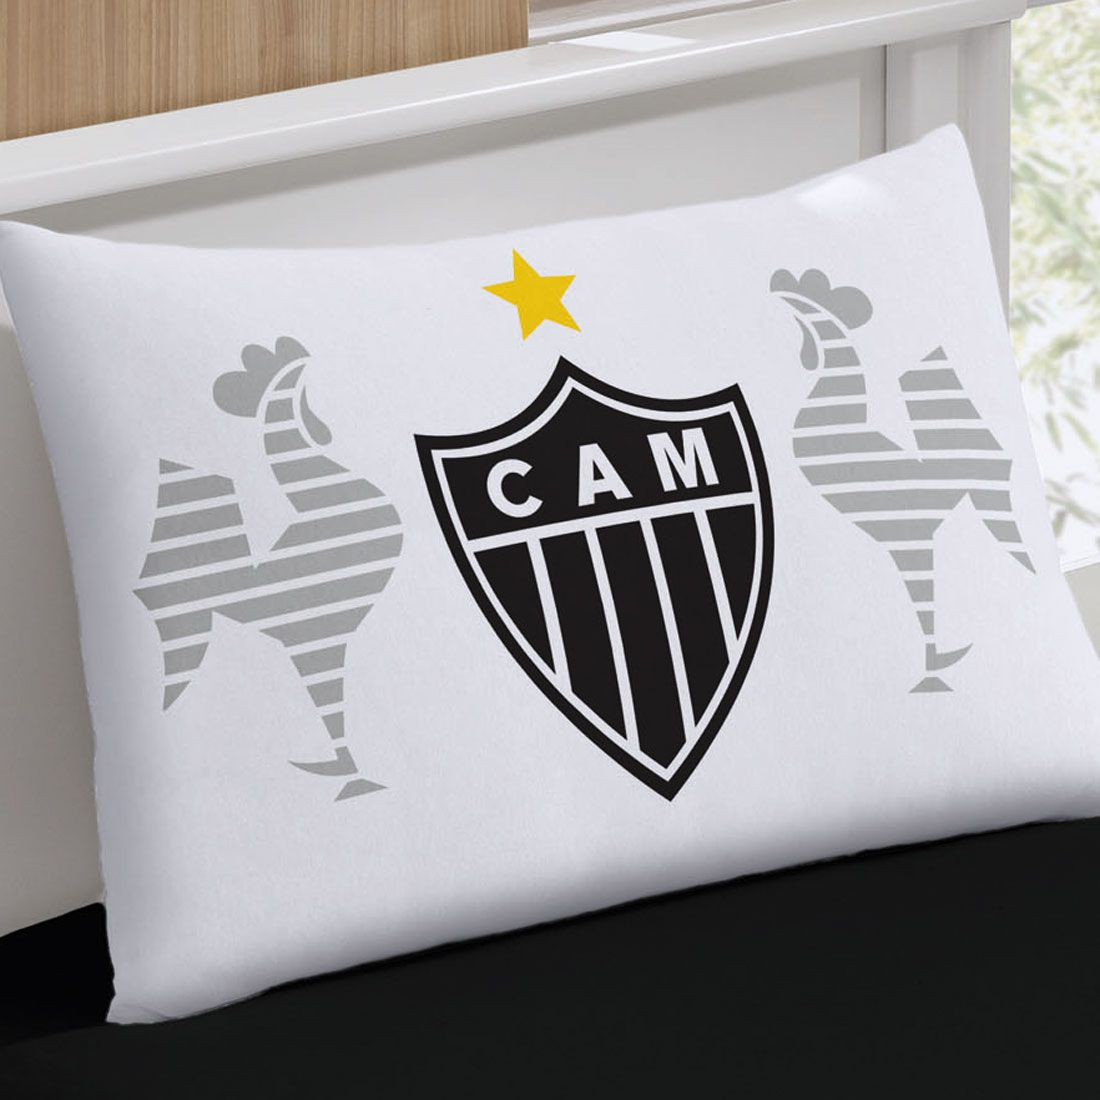 Fronha Avulsa Buettner Estampada Malha Clube Atletico Mineiro Branca Hajato Loja E Departamentos